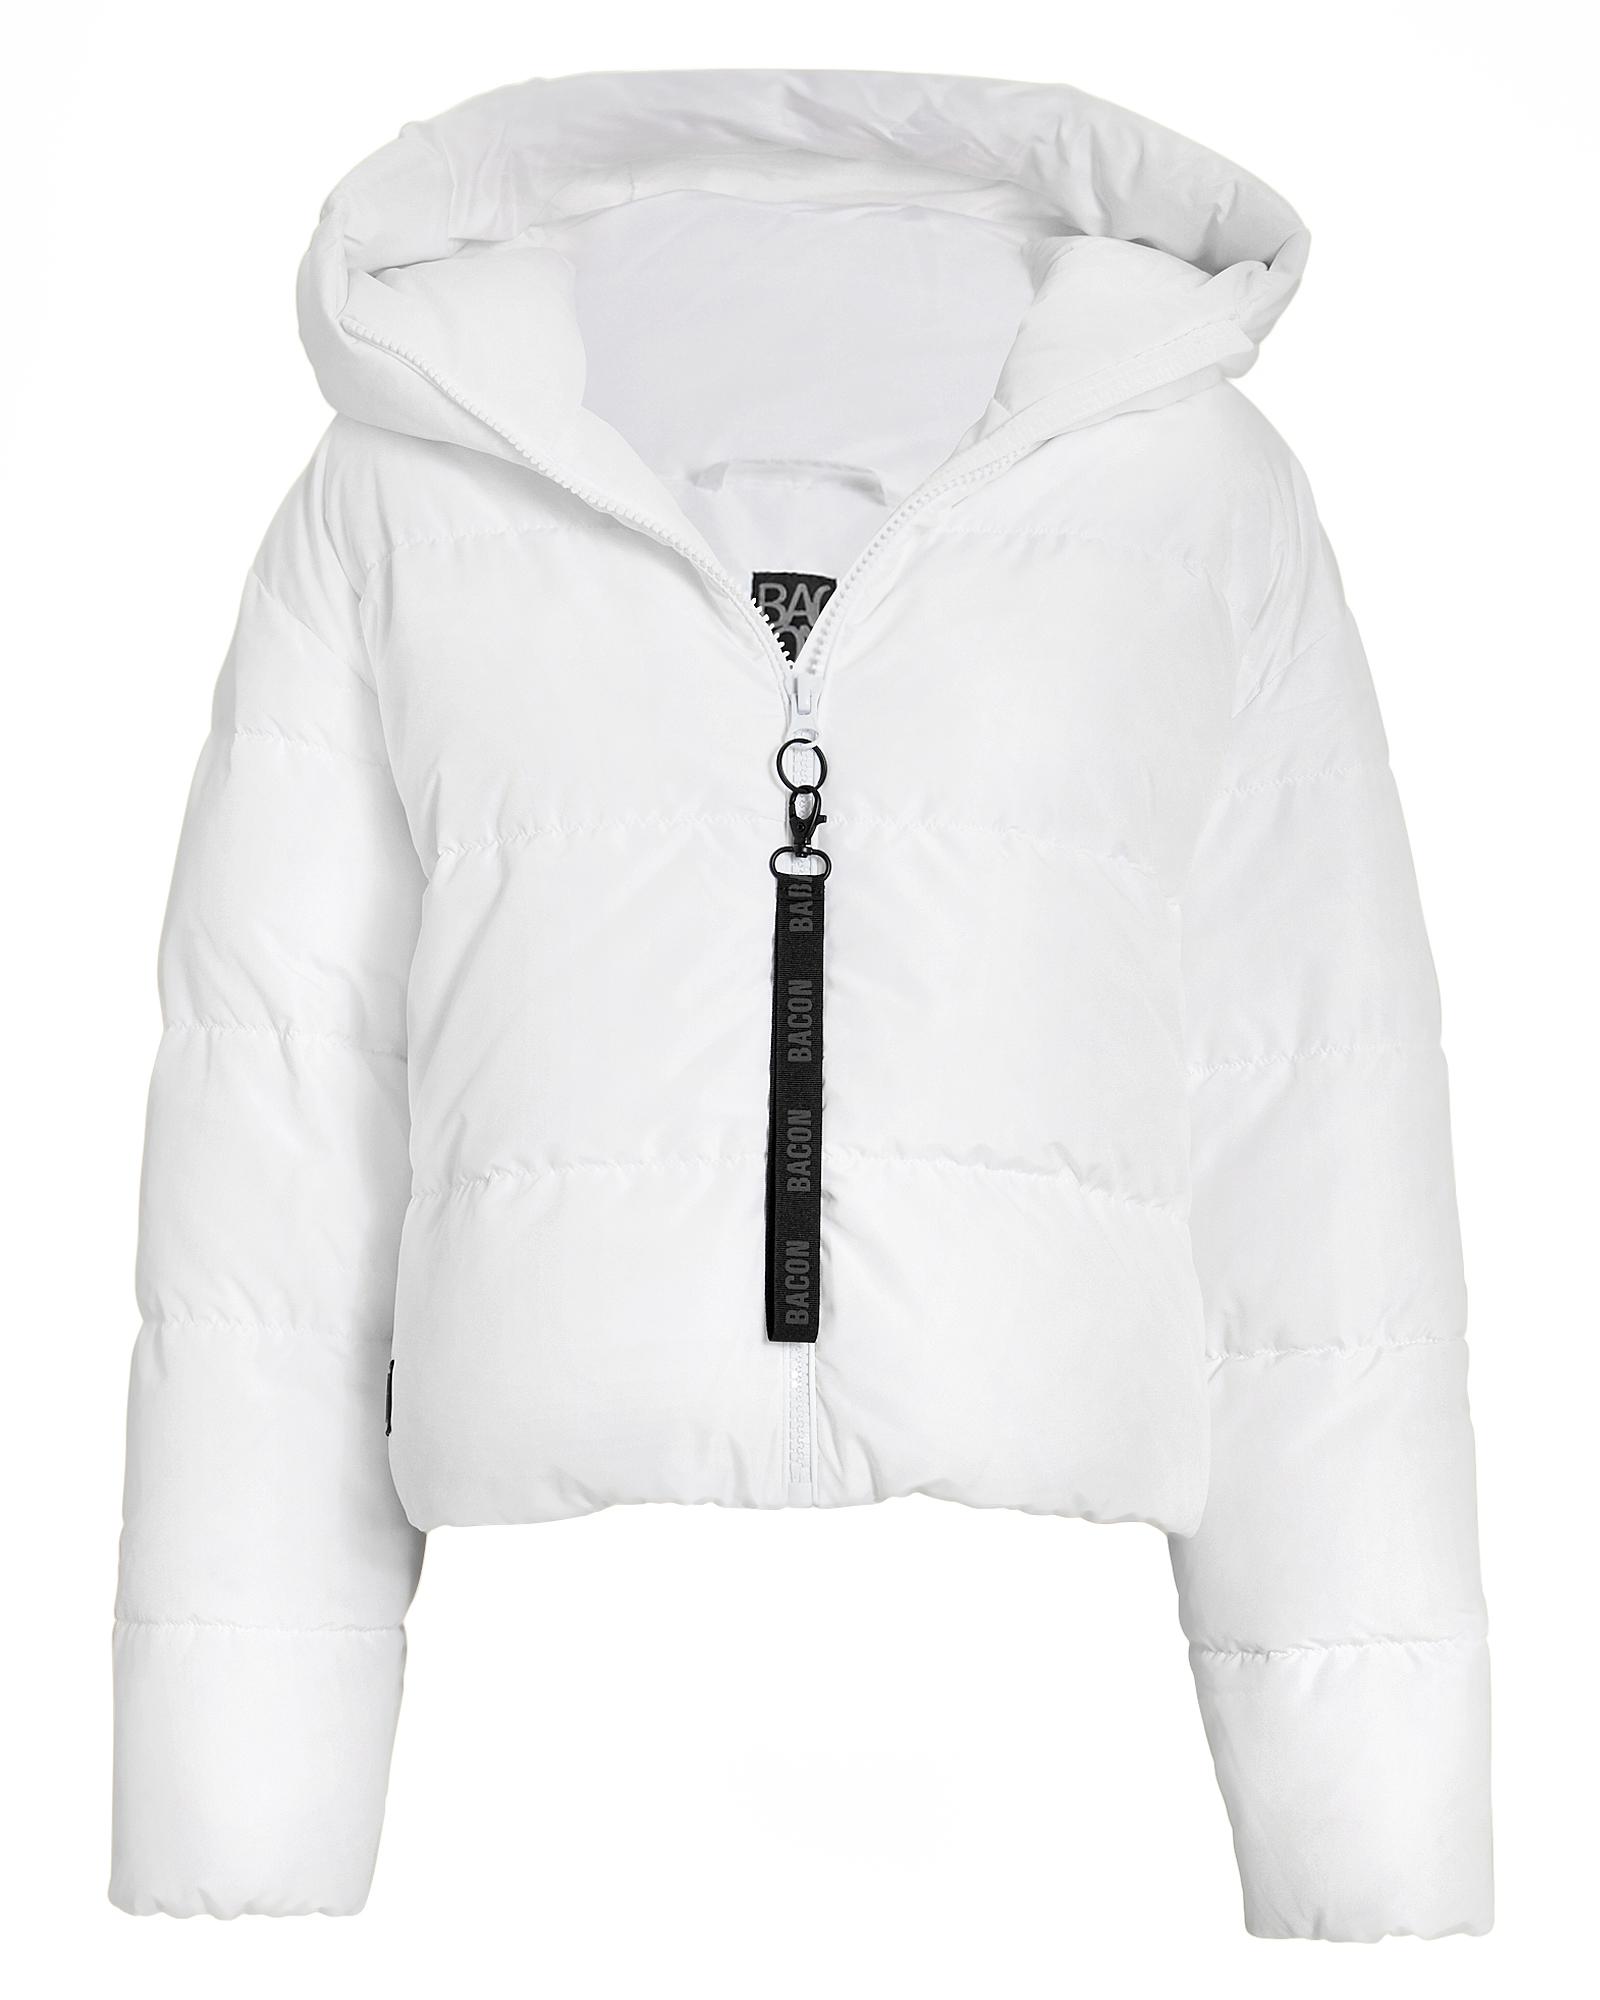 BACON Cloud White Puffer Jacket